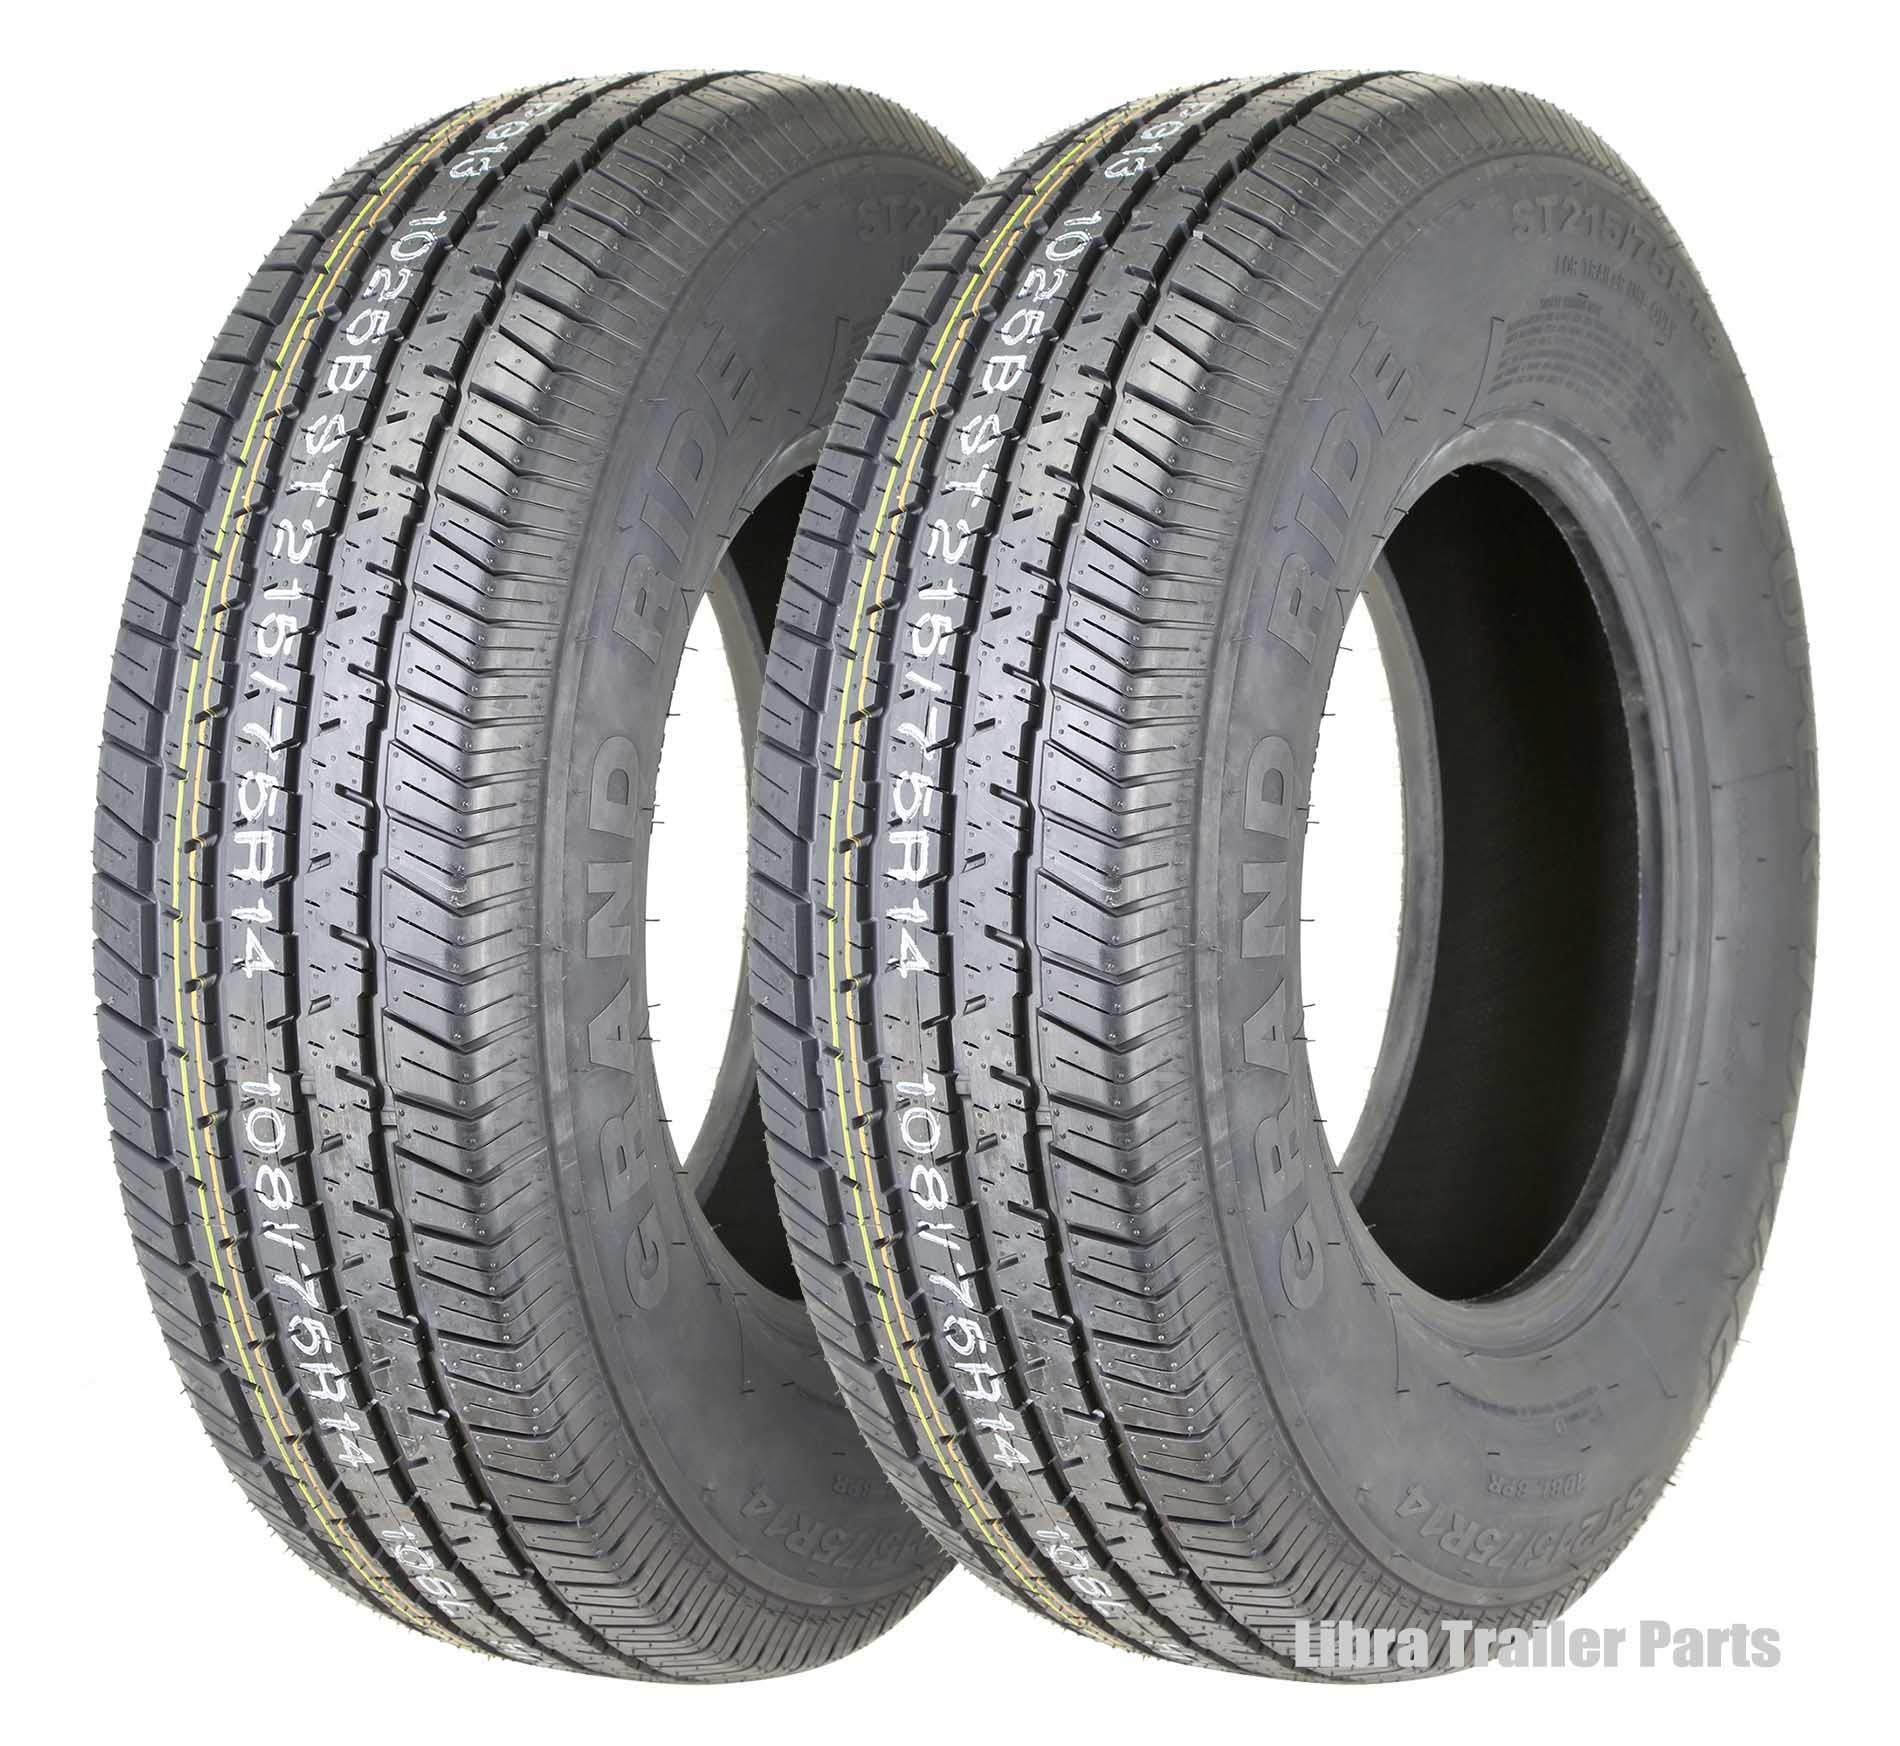 2 New Premium Grand Ride Trailer Tires ST 215/75R14 8PR Load Range D - 11060 …